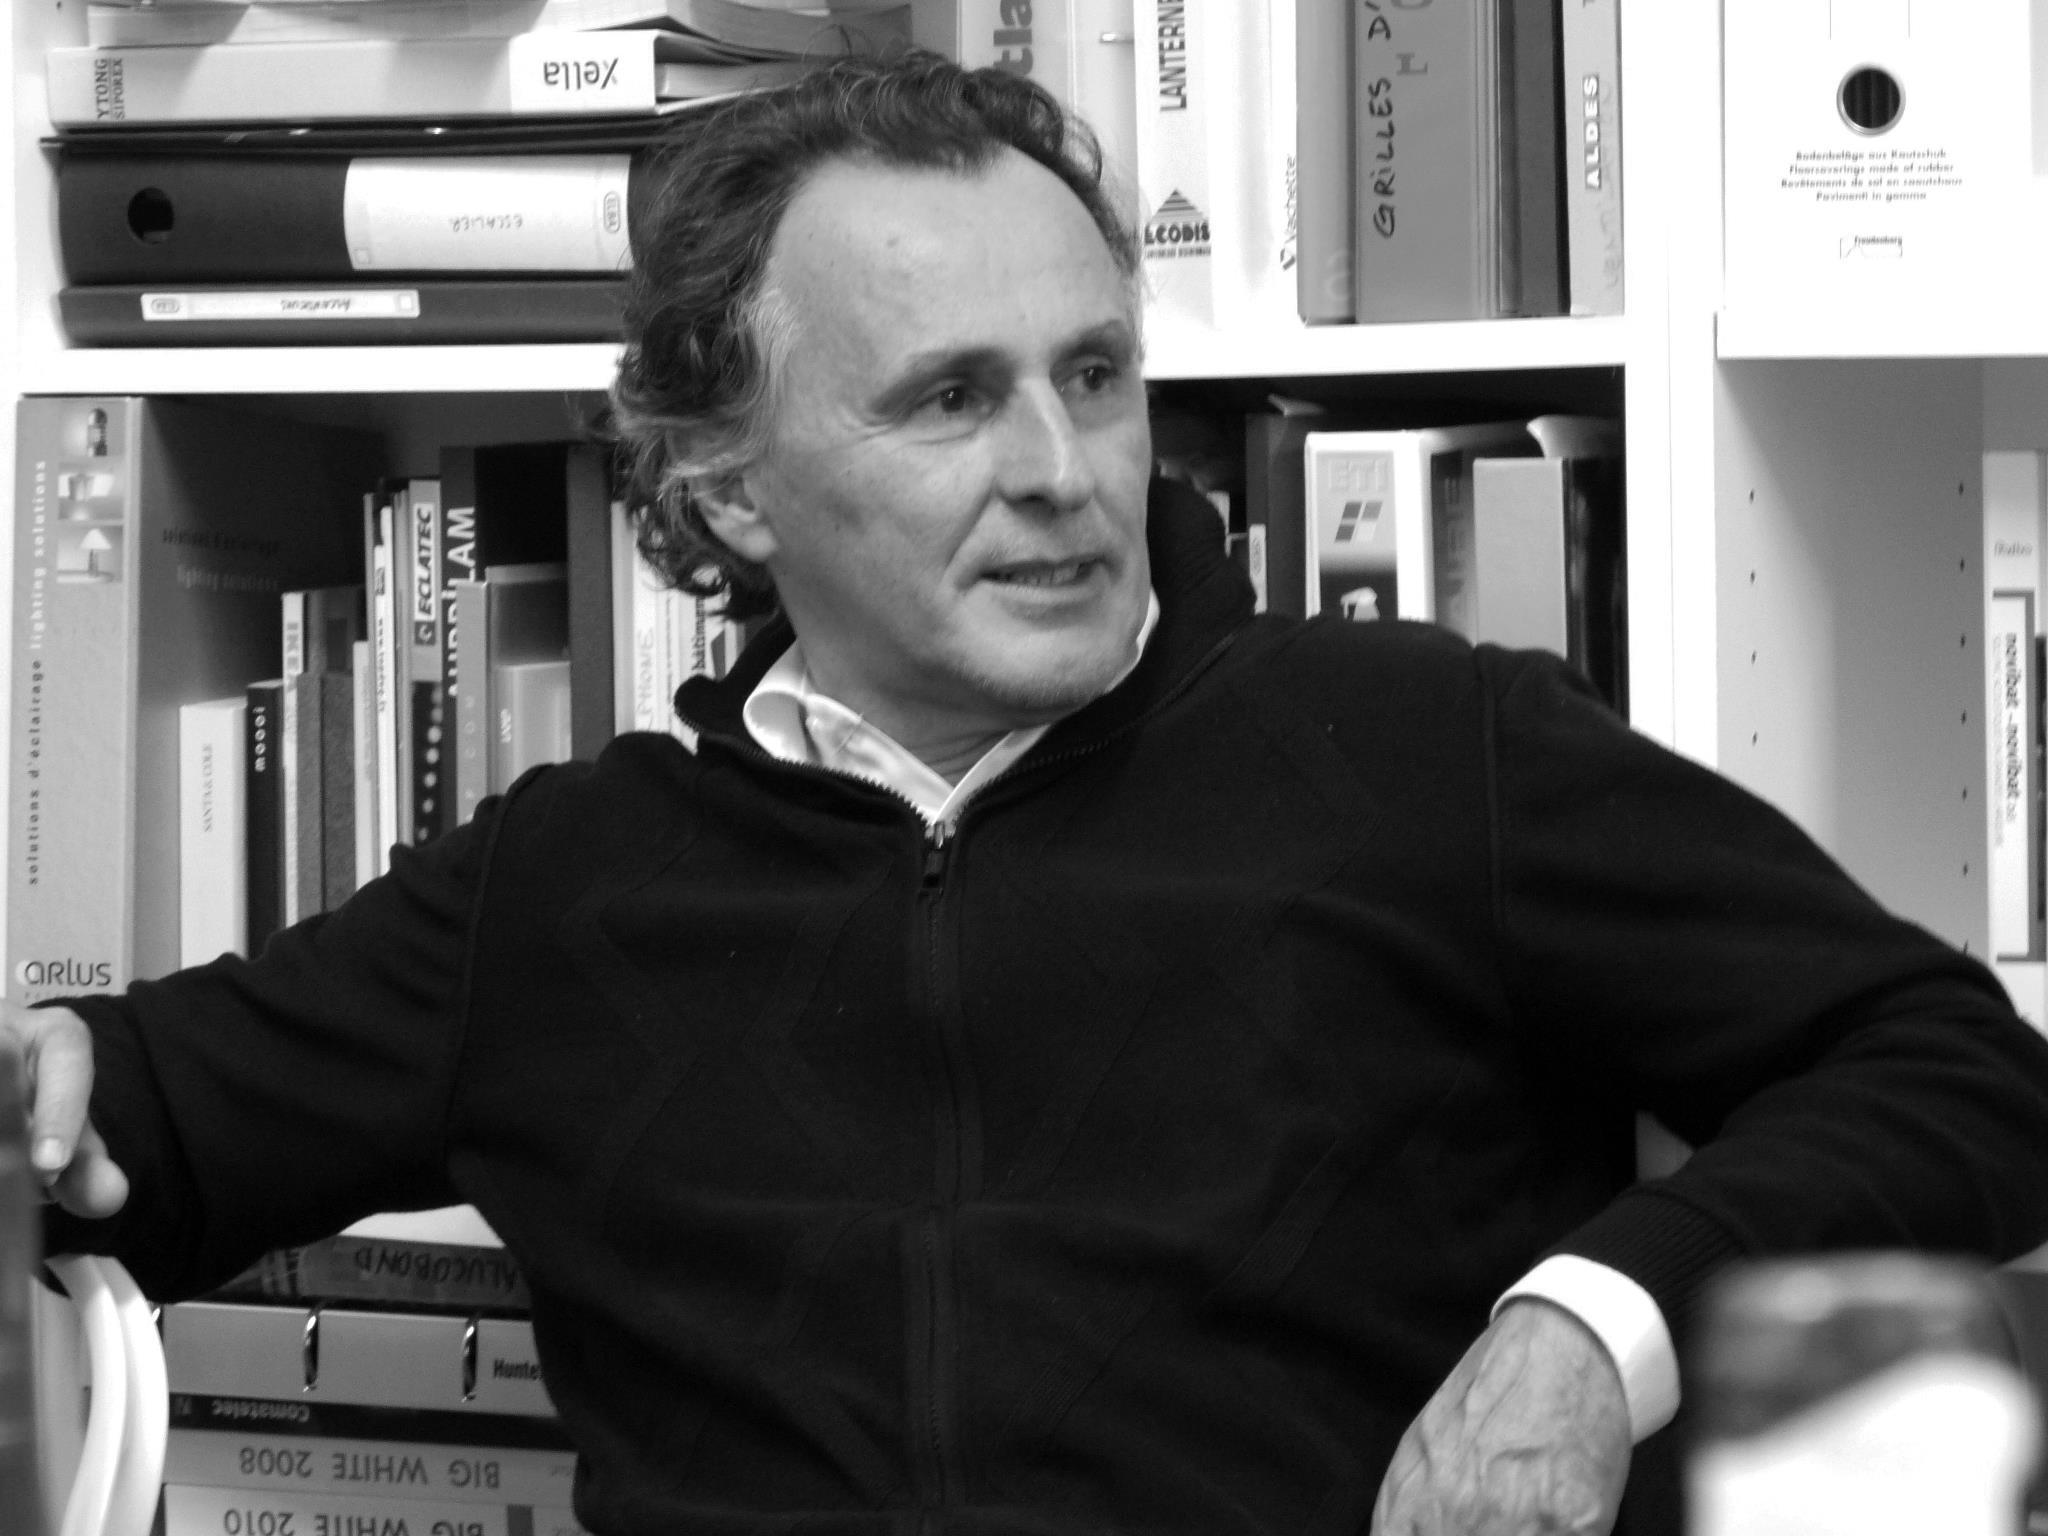 Philippe Vignaud